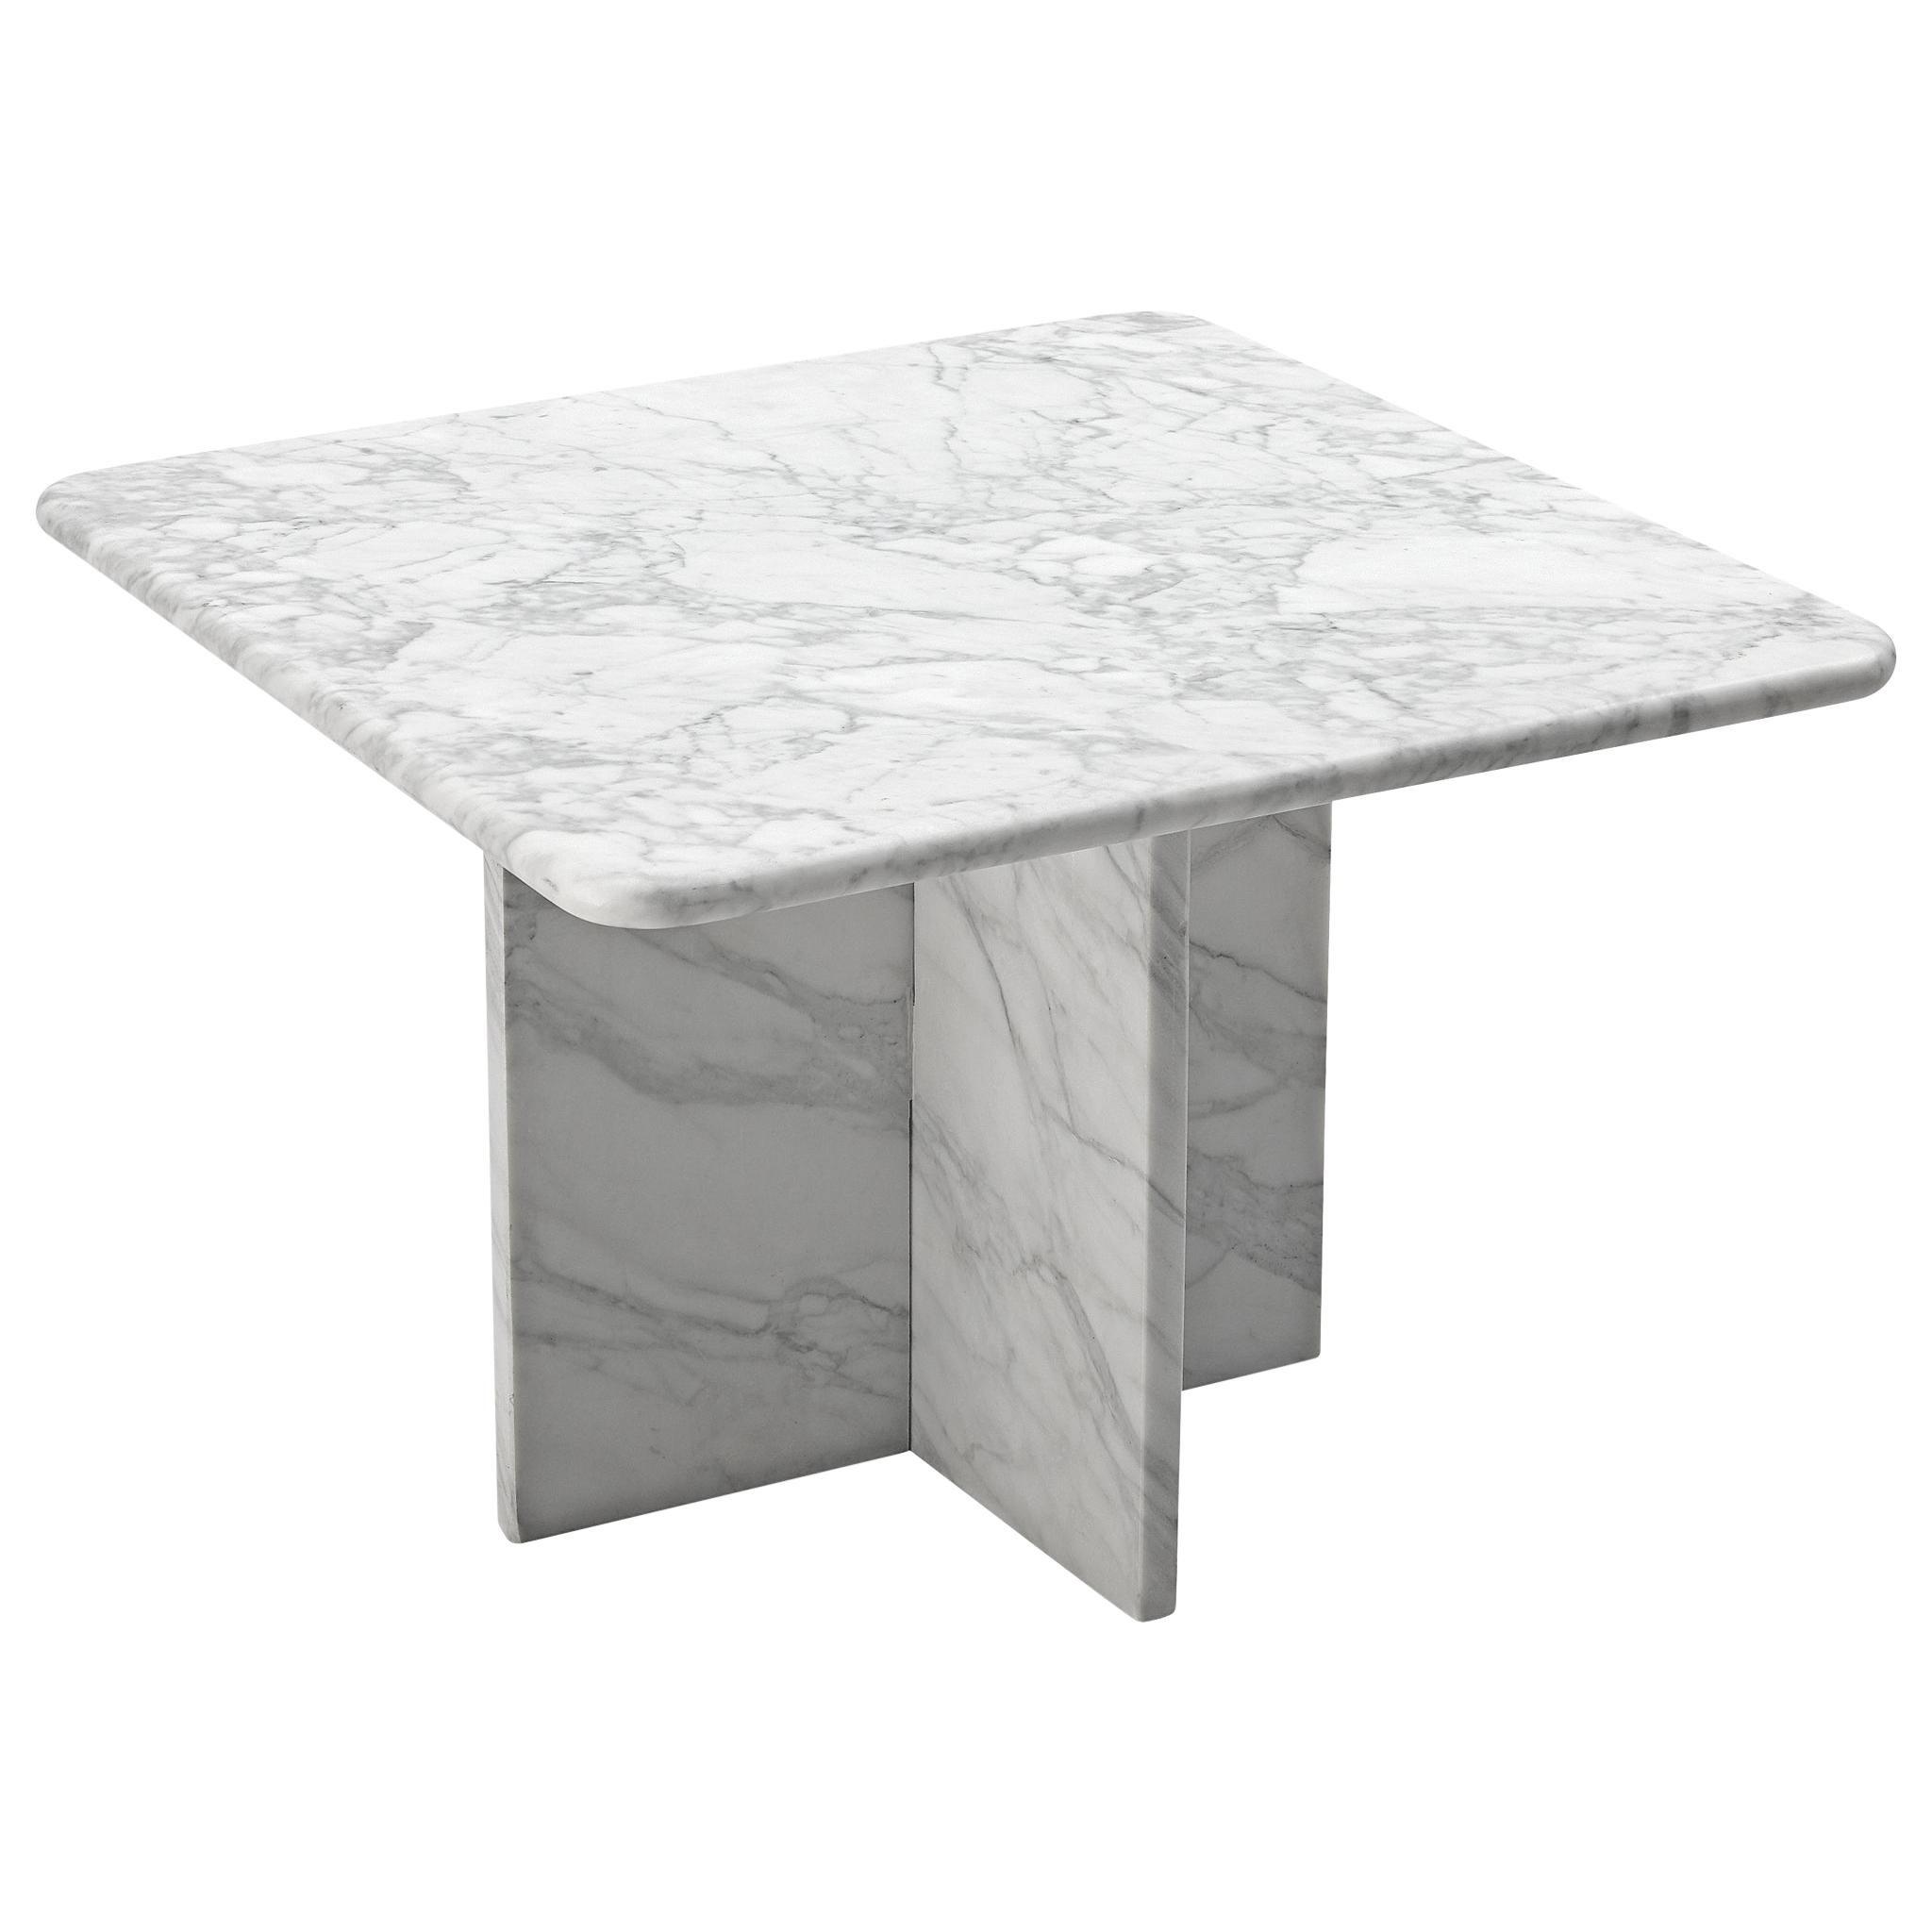 Coffee Table in Carrara Marble